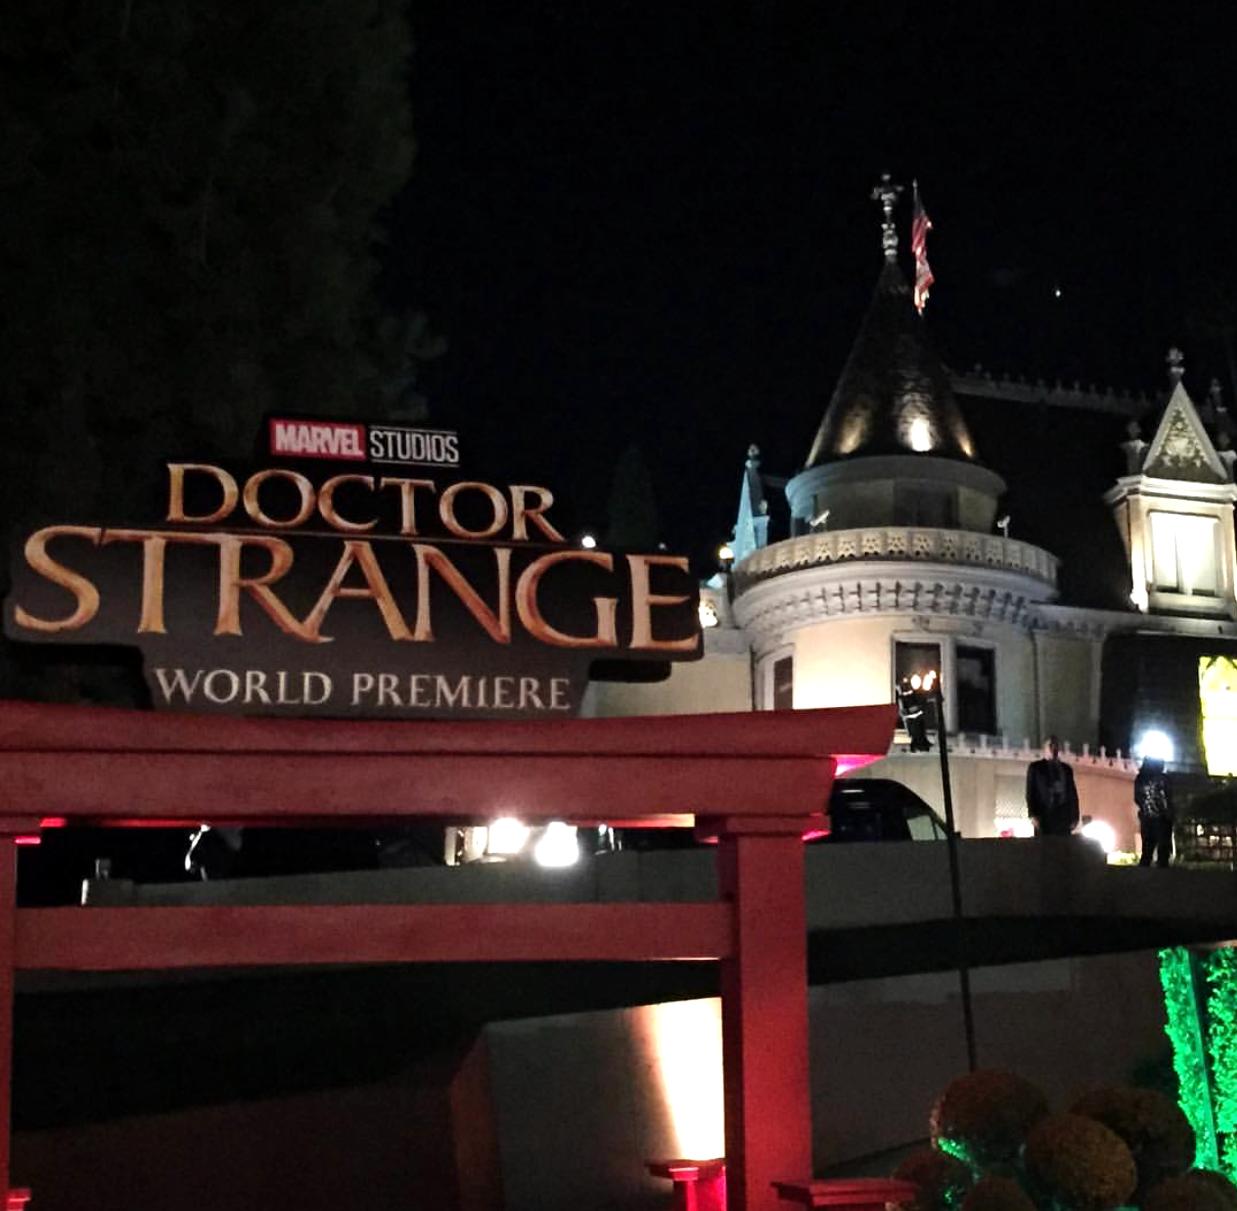 doctor-strange-movie-premiere-magic-castle-party